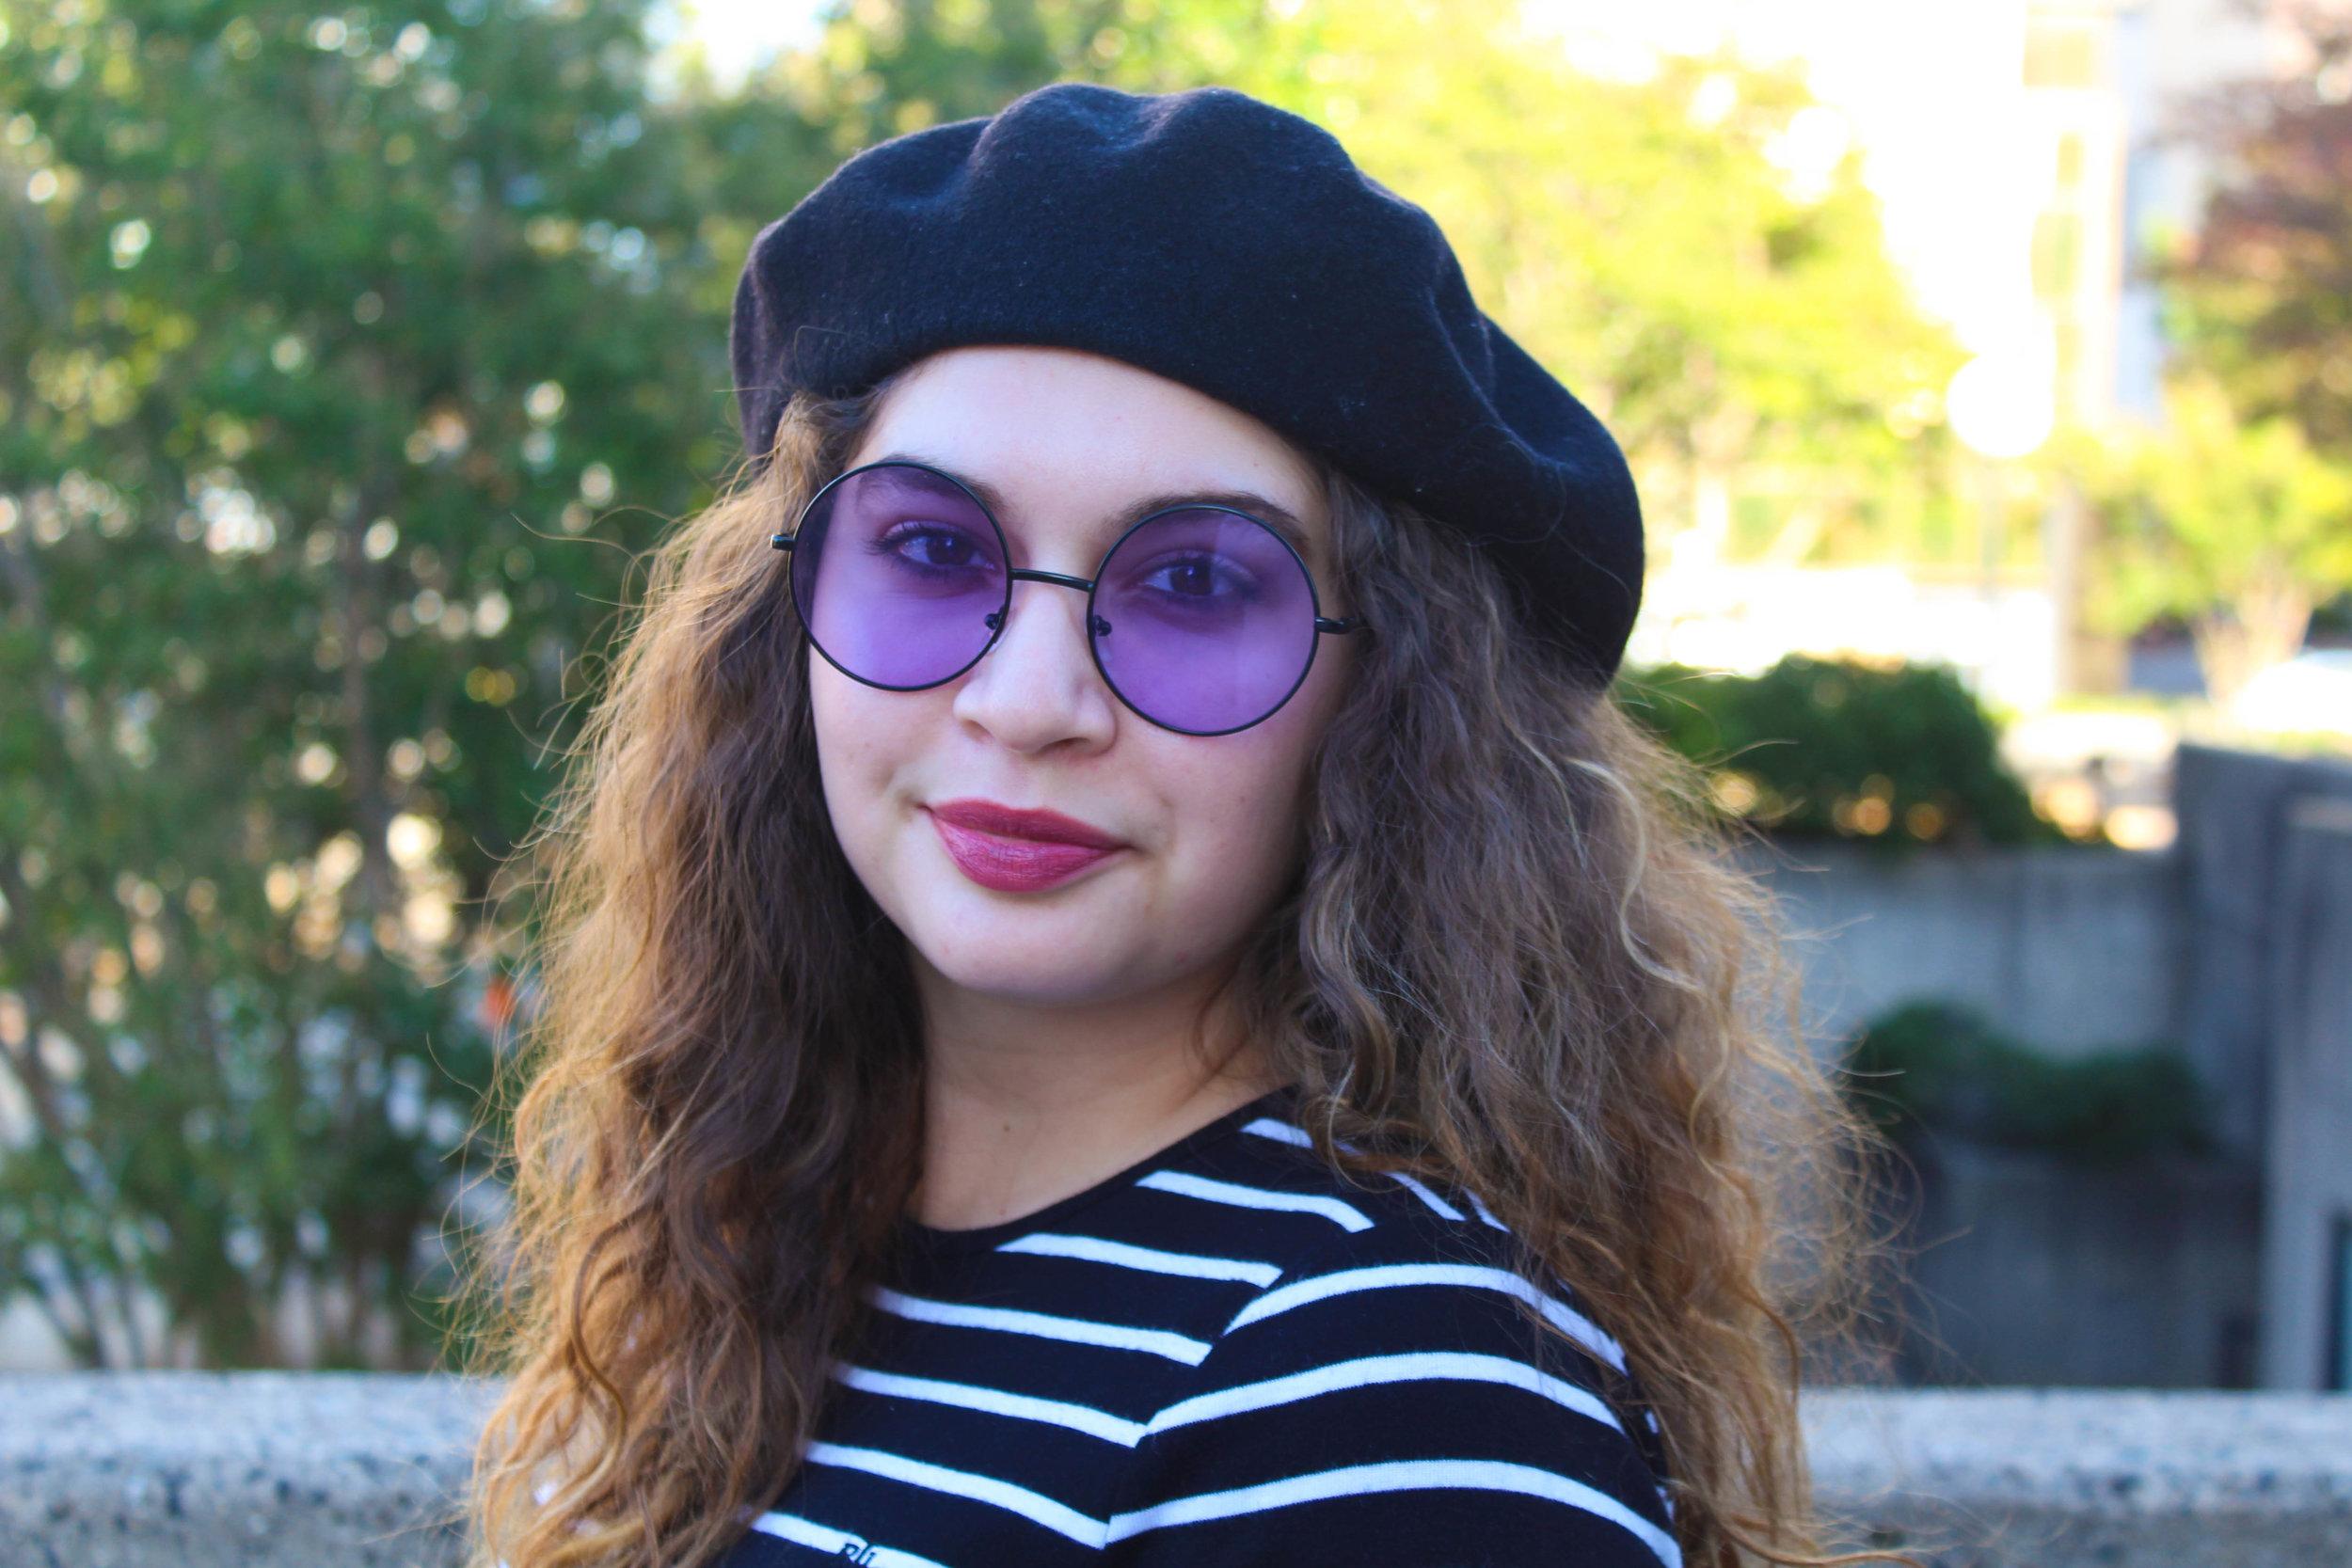 French girl-2-1378.jpg